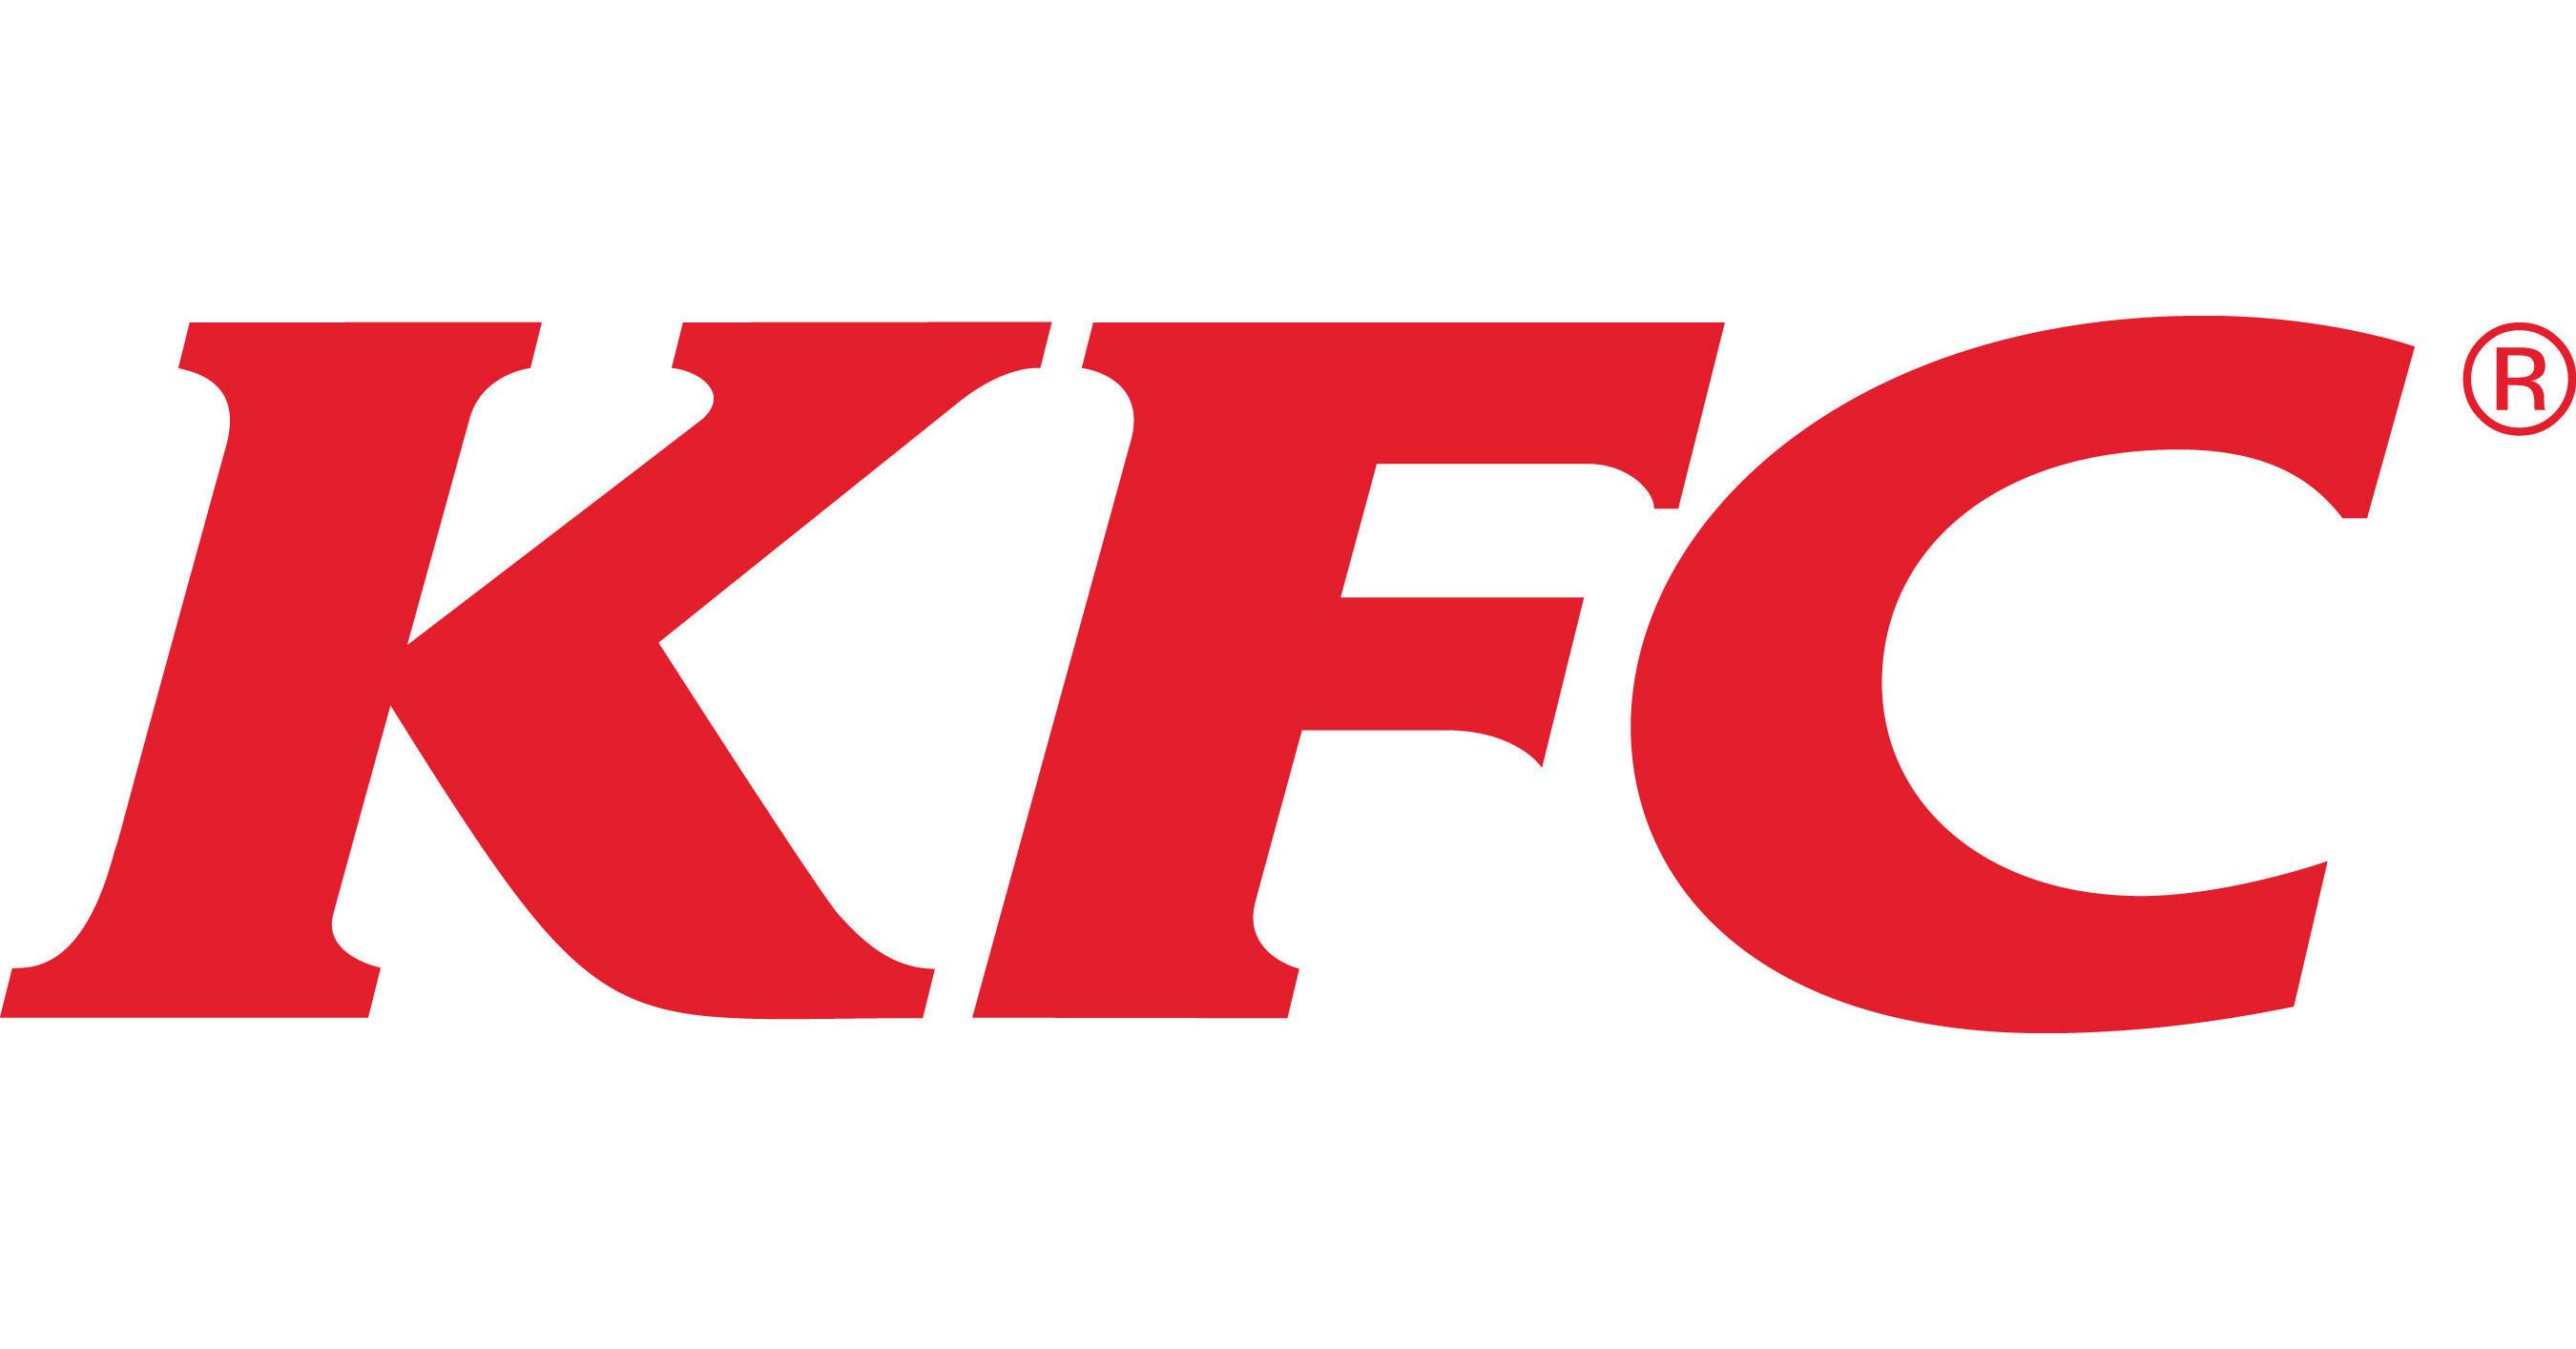 Kfc Logo: KFC Announces Commitment To Eliminate Antibiotics